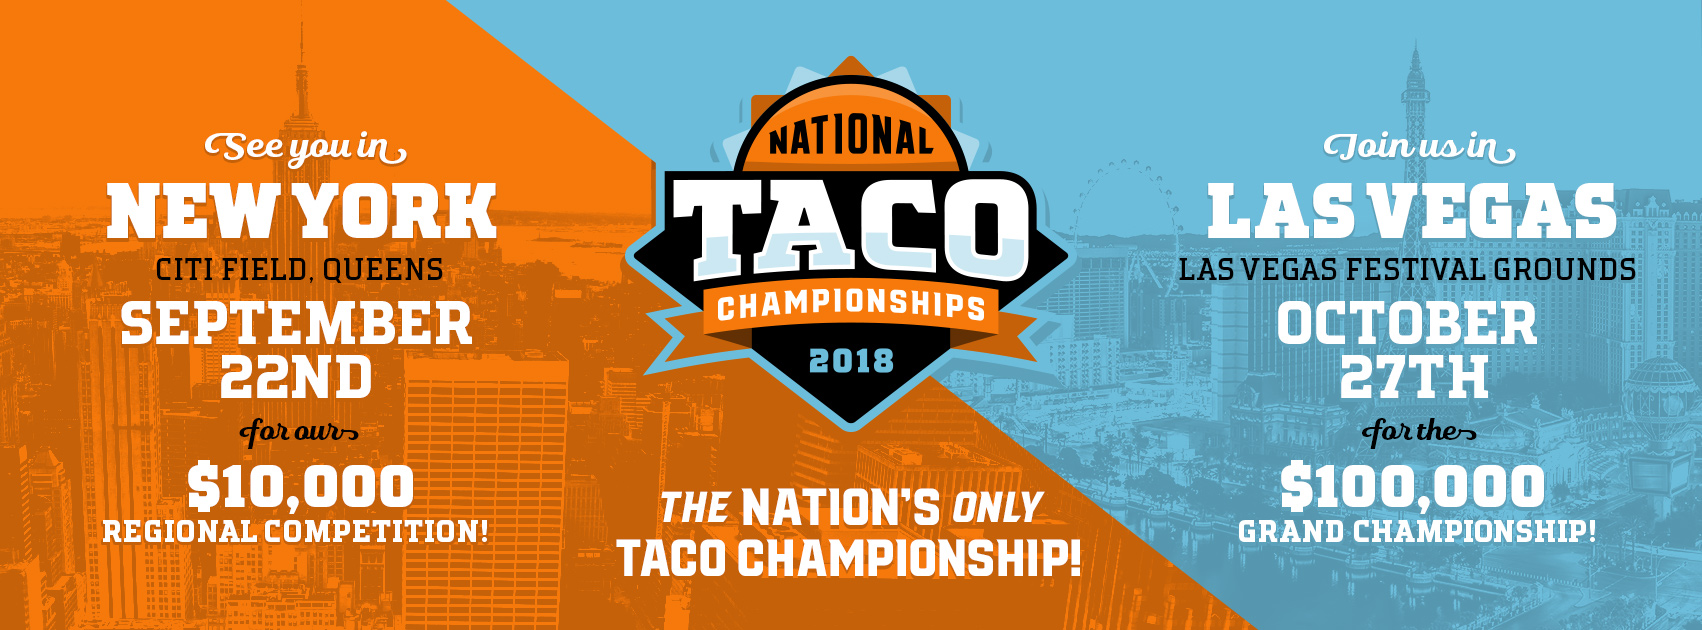 National Taco Championships